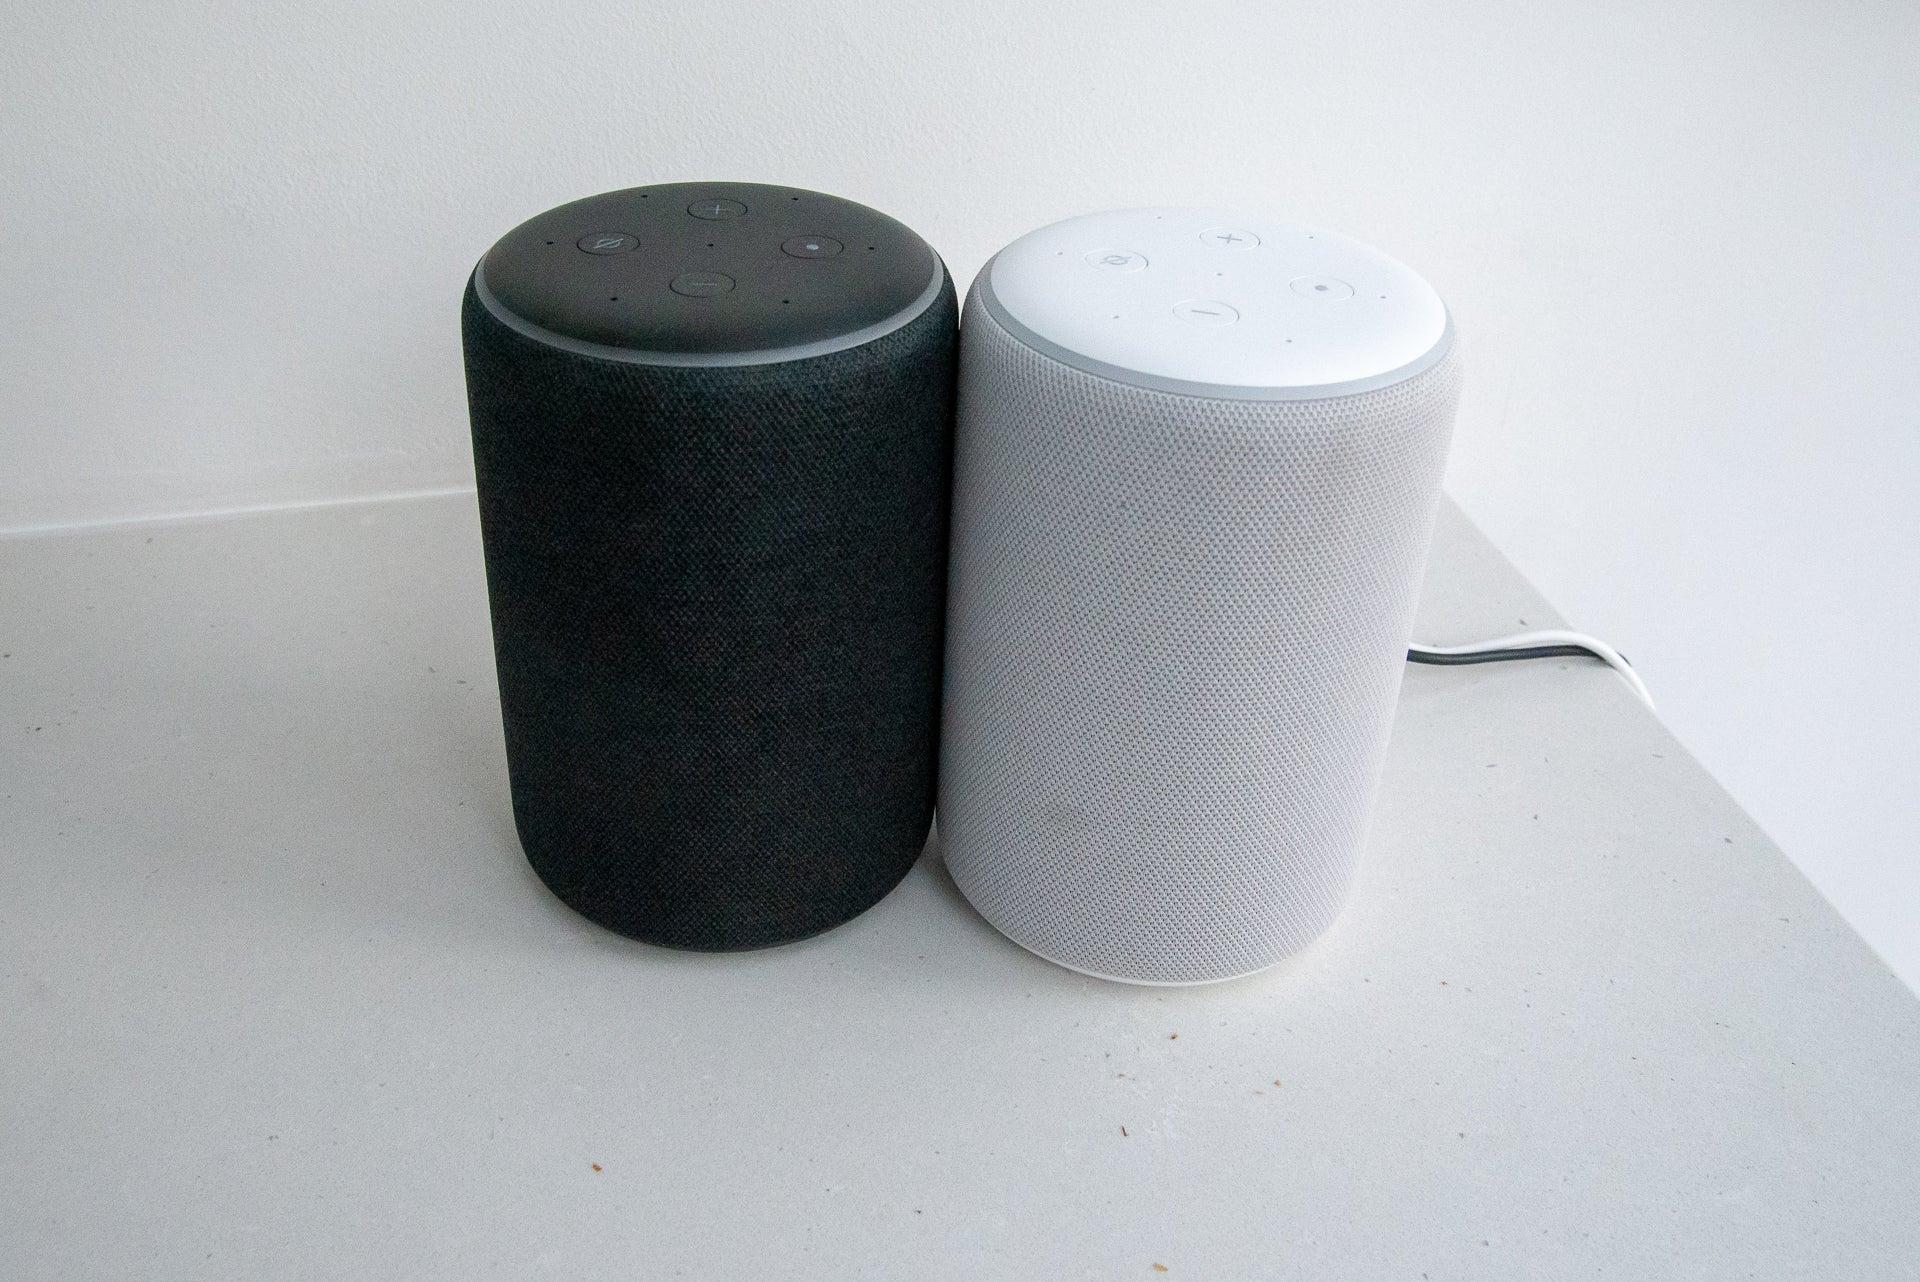 pair sonos speaker with your echo dot identify